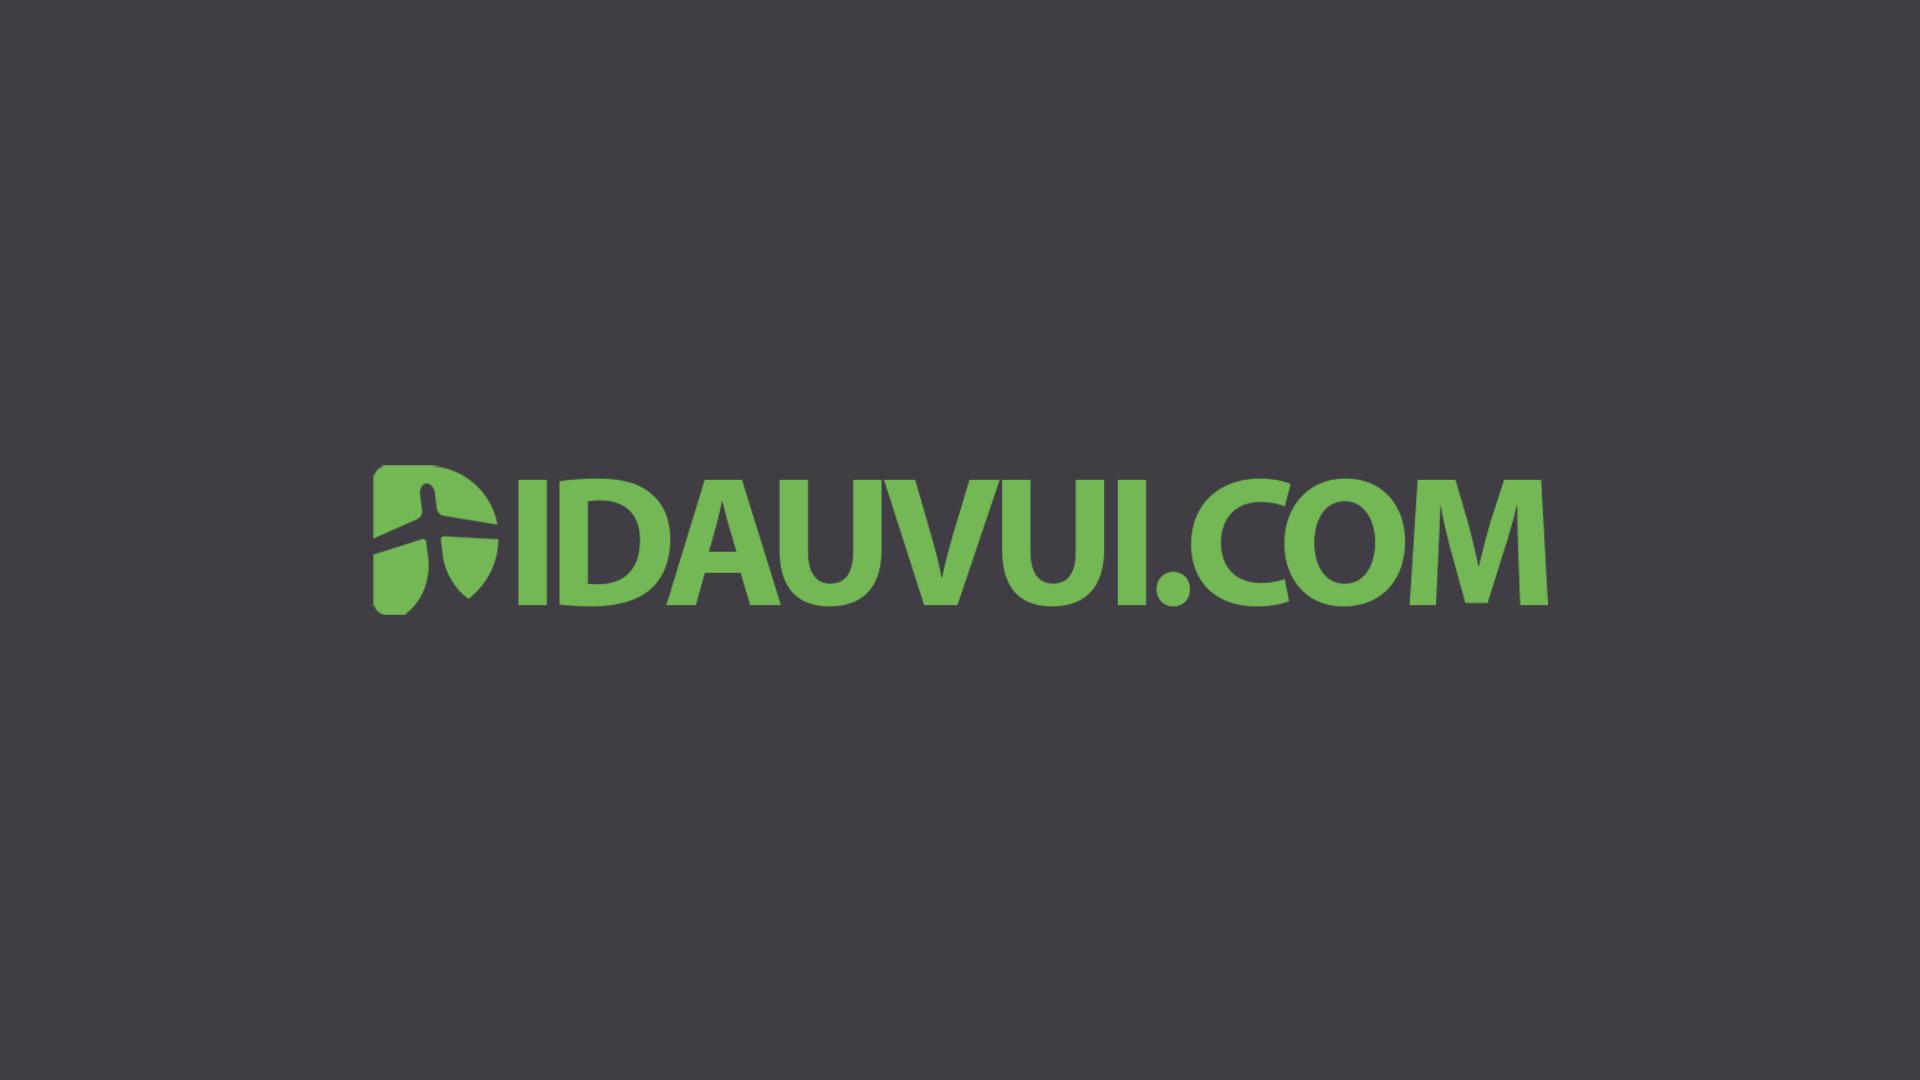 branding_logo_trailfindr.